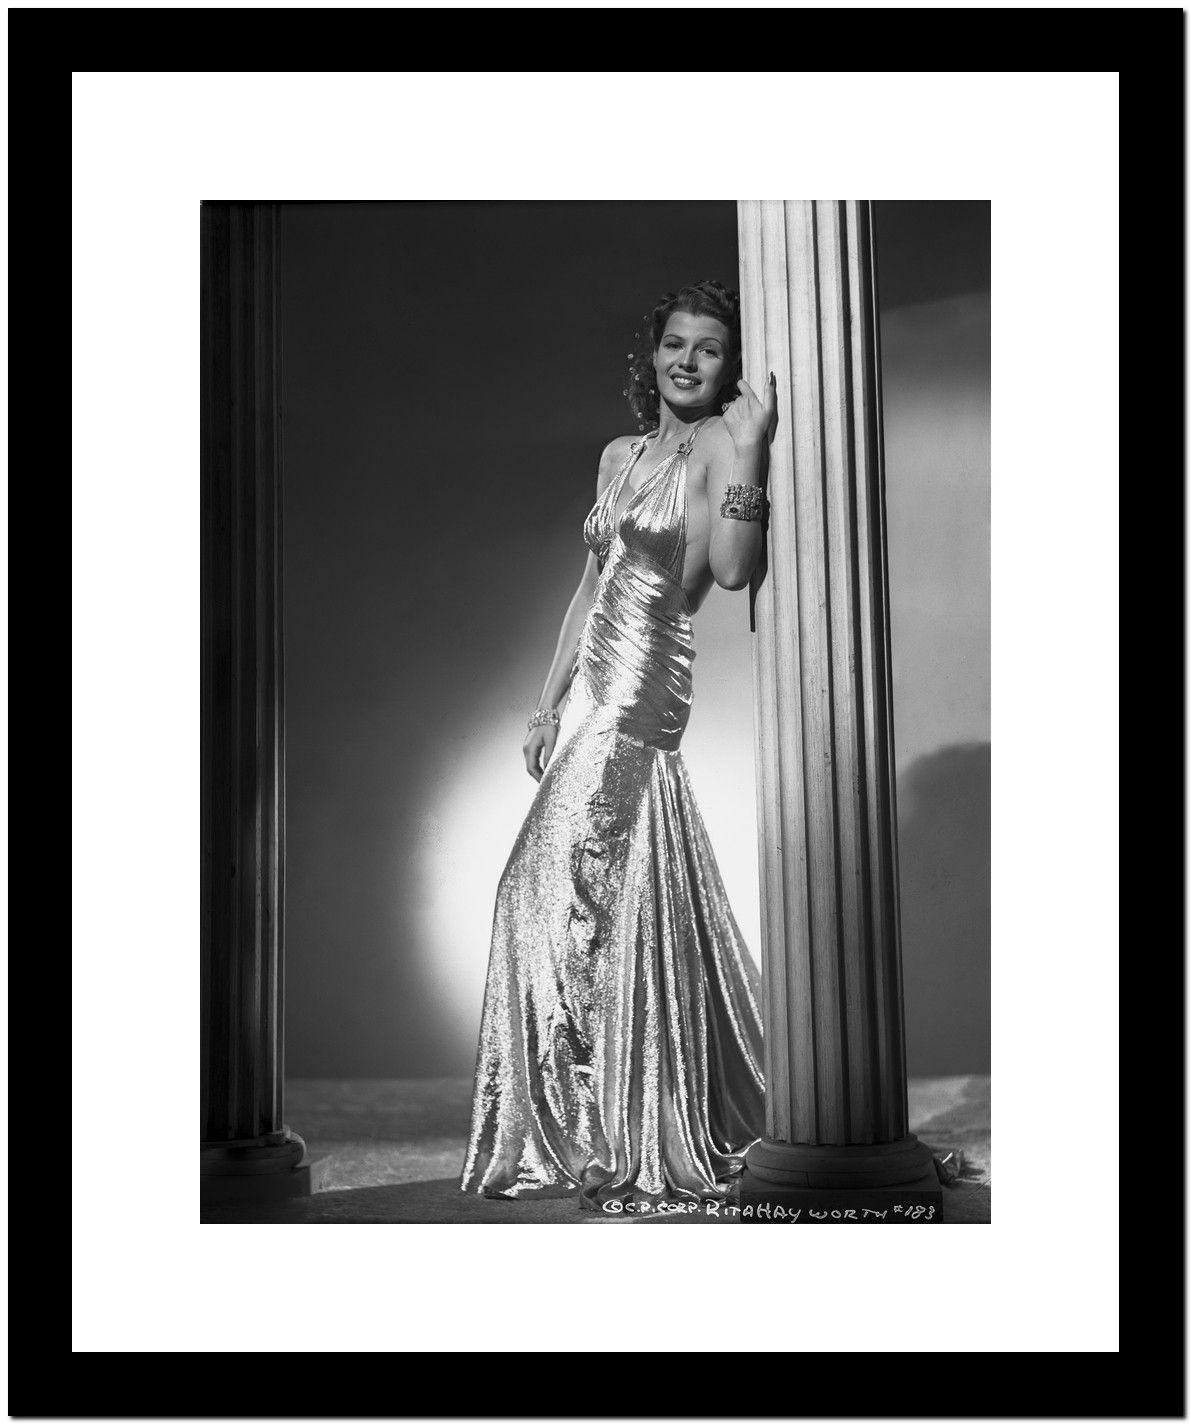 Rita Hayworth Leaning on Post in Black Gown Premium Art Print